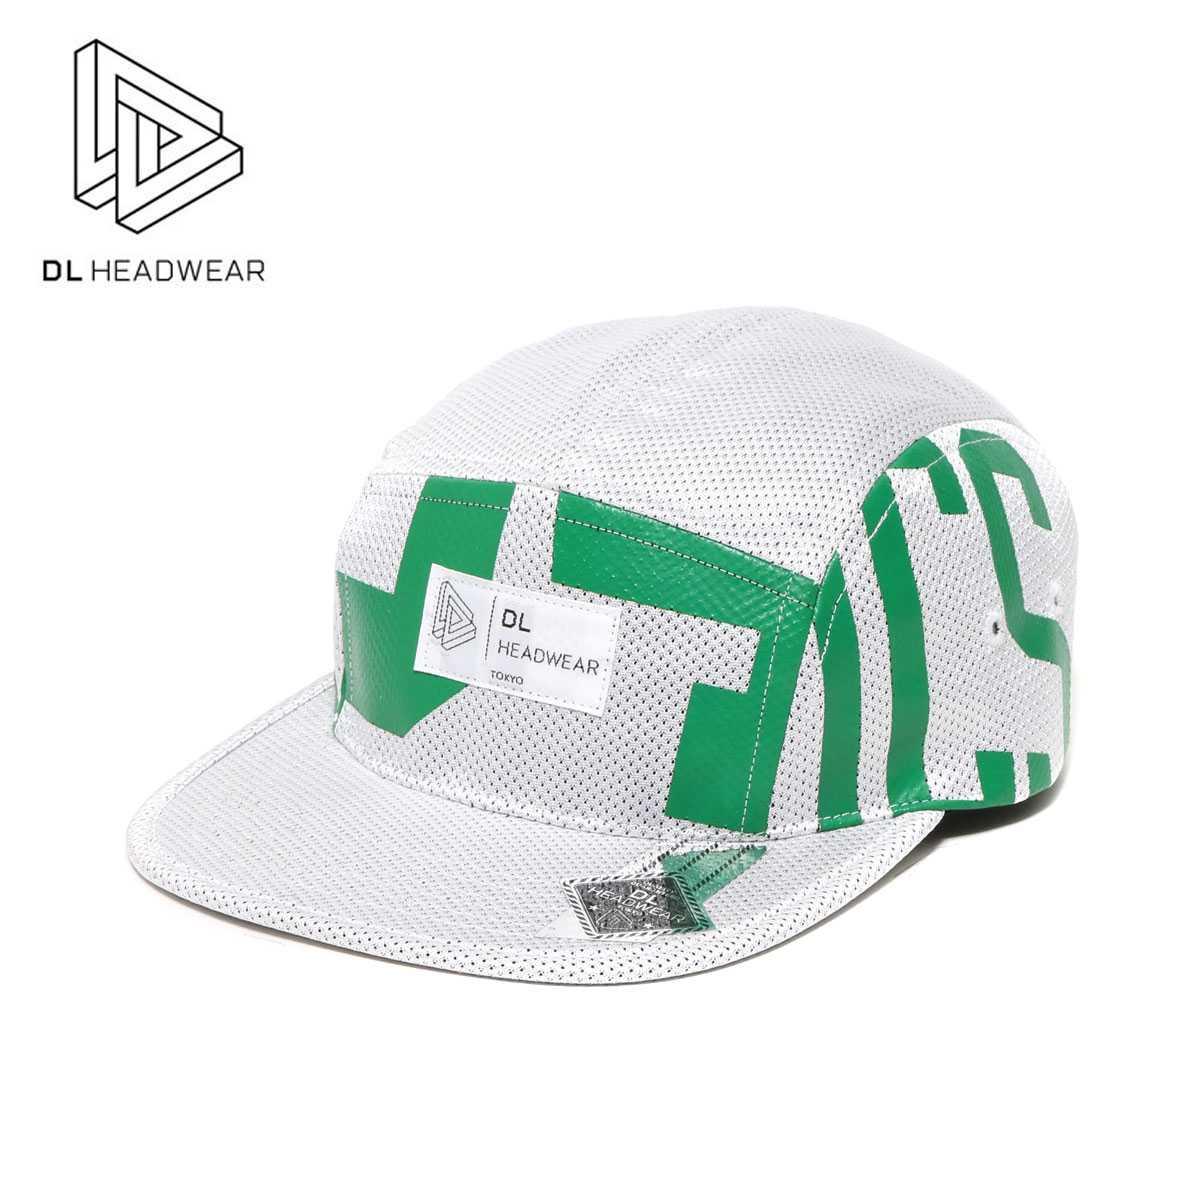 DL Headwear Alpha 5Panel Camp Cap Made by vintage NBA Jersey(Paul Pierce / Boston Celtics)(ディーエル ヘッドウェア アルファ ファイブパネルキャンプキャップ / ポール・ピアース)【Kinetics】【NBA】【バスケットボール】【帽子】【17SS-I】